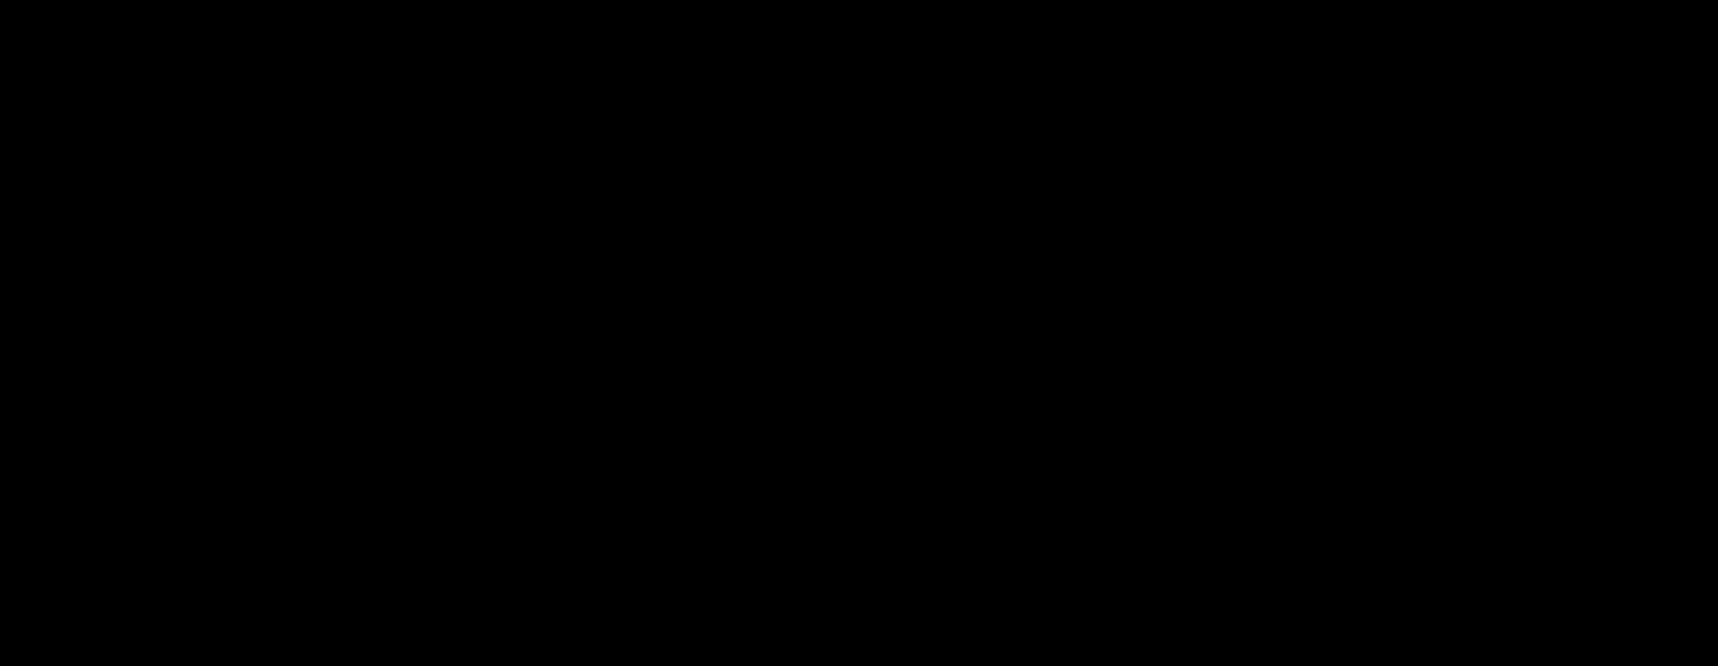 101 1016766 bts logo png clip art transparent download bts